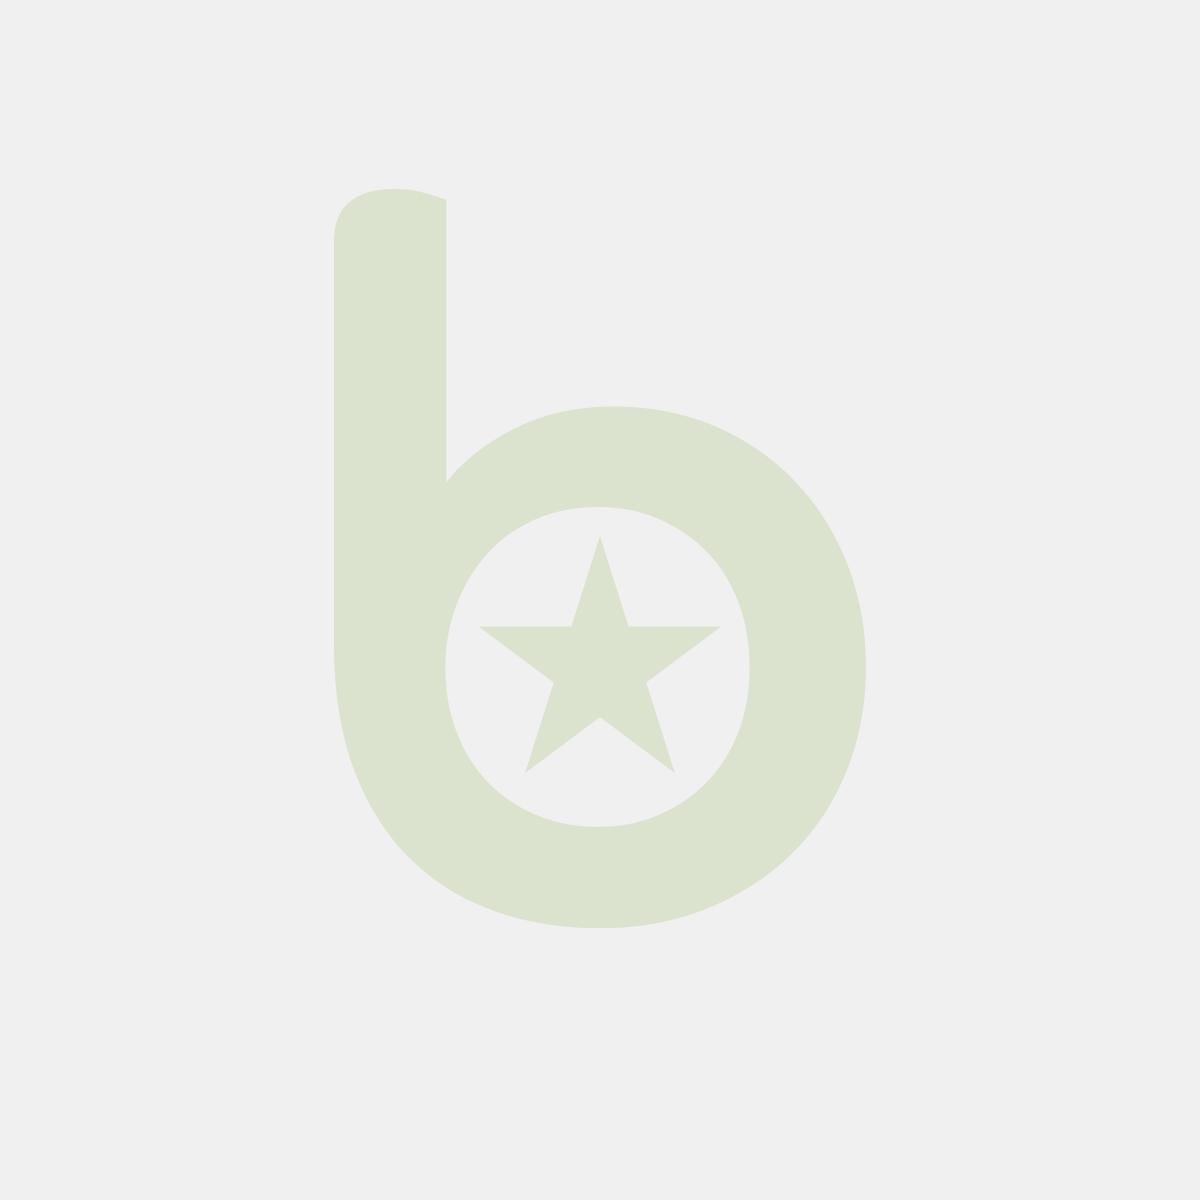 FINGERFOOD - pucharek PS 70ml biały 4,9xh.7,7cm op. 25 sztuk